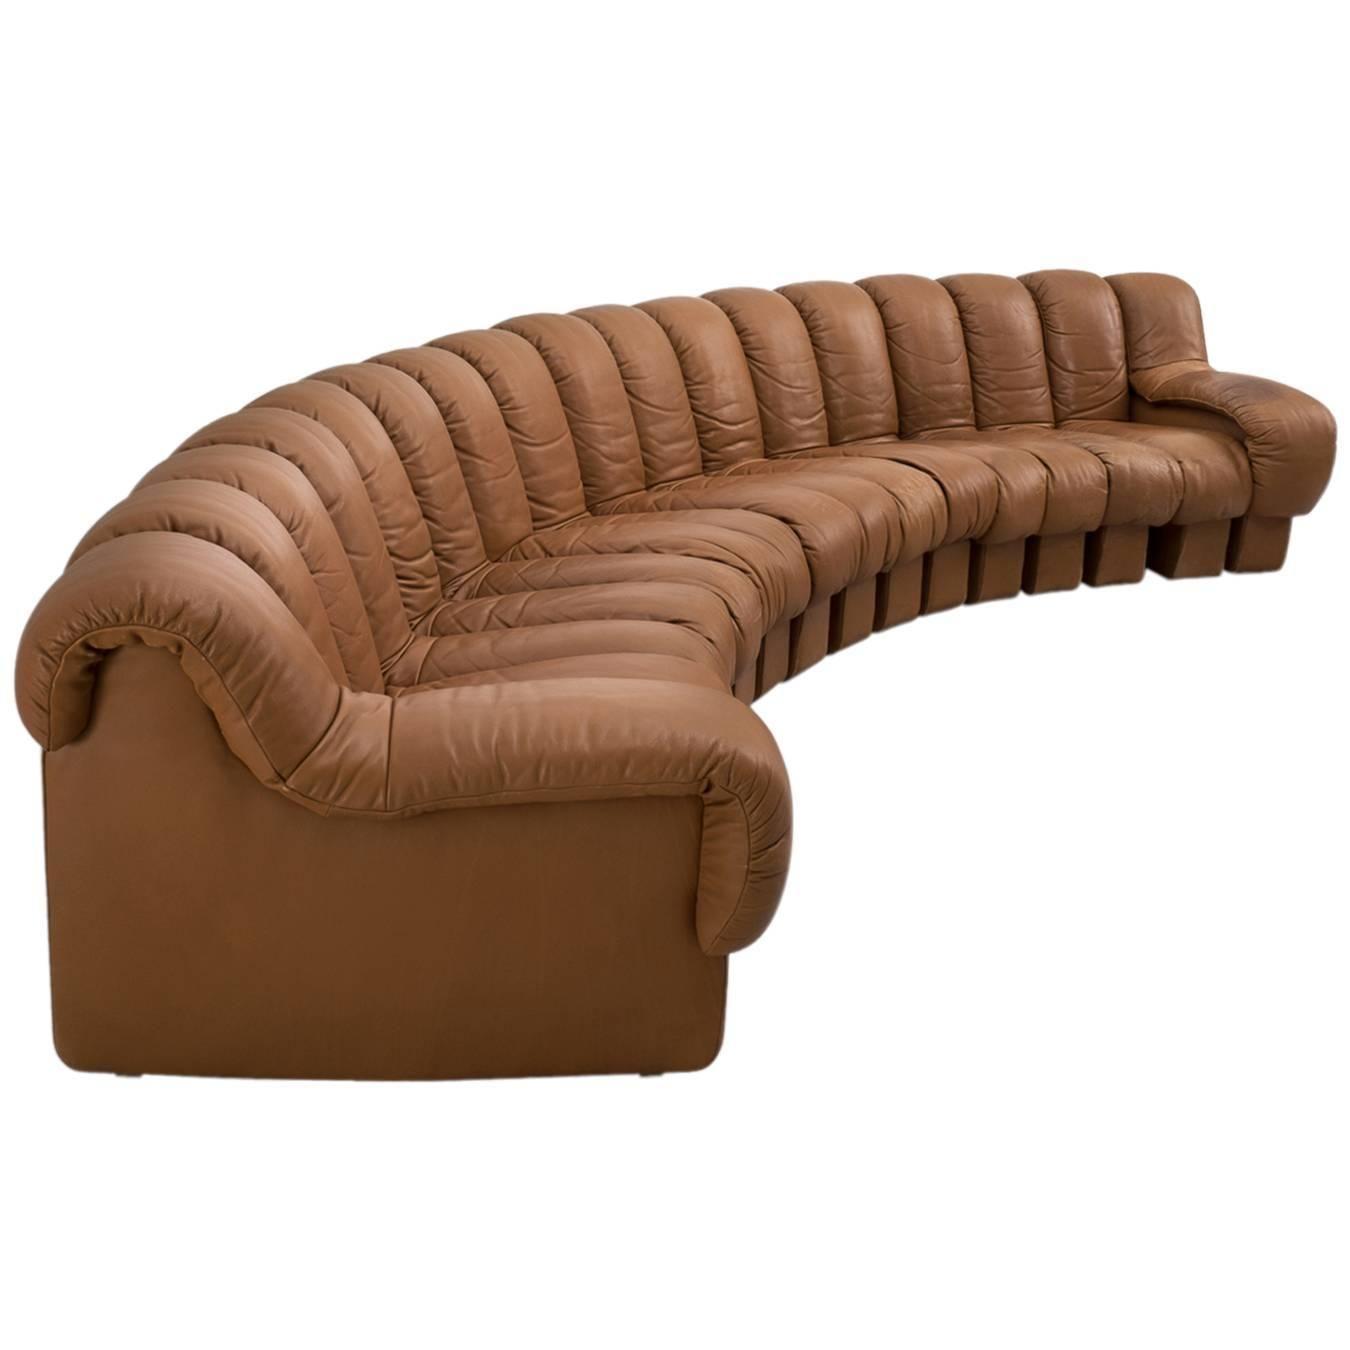 De Sede Ds 600 Non Stop Sectional Sofa In Cognac Leather Sectional Sofa Sectional Furniture